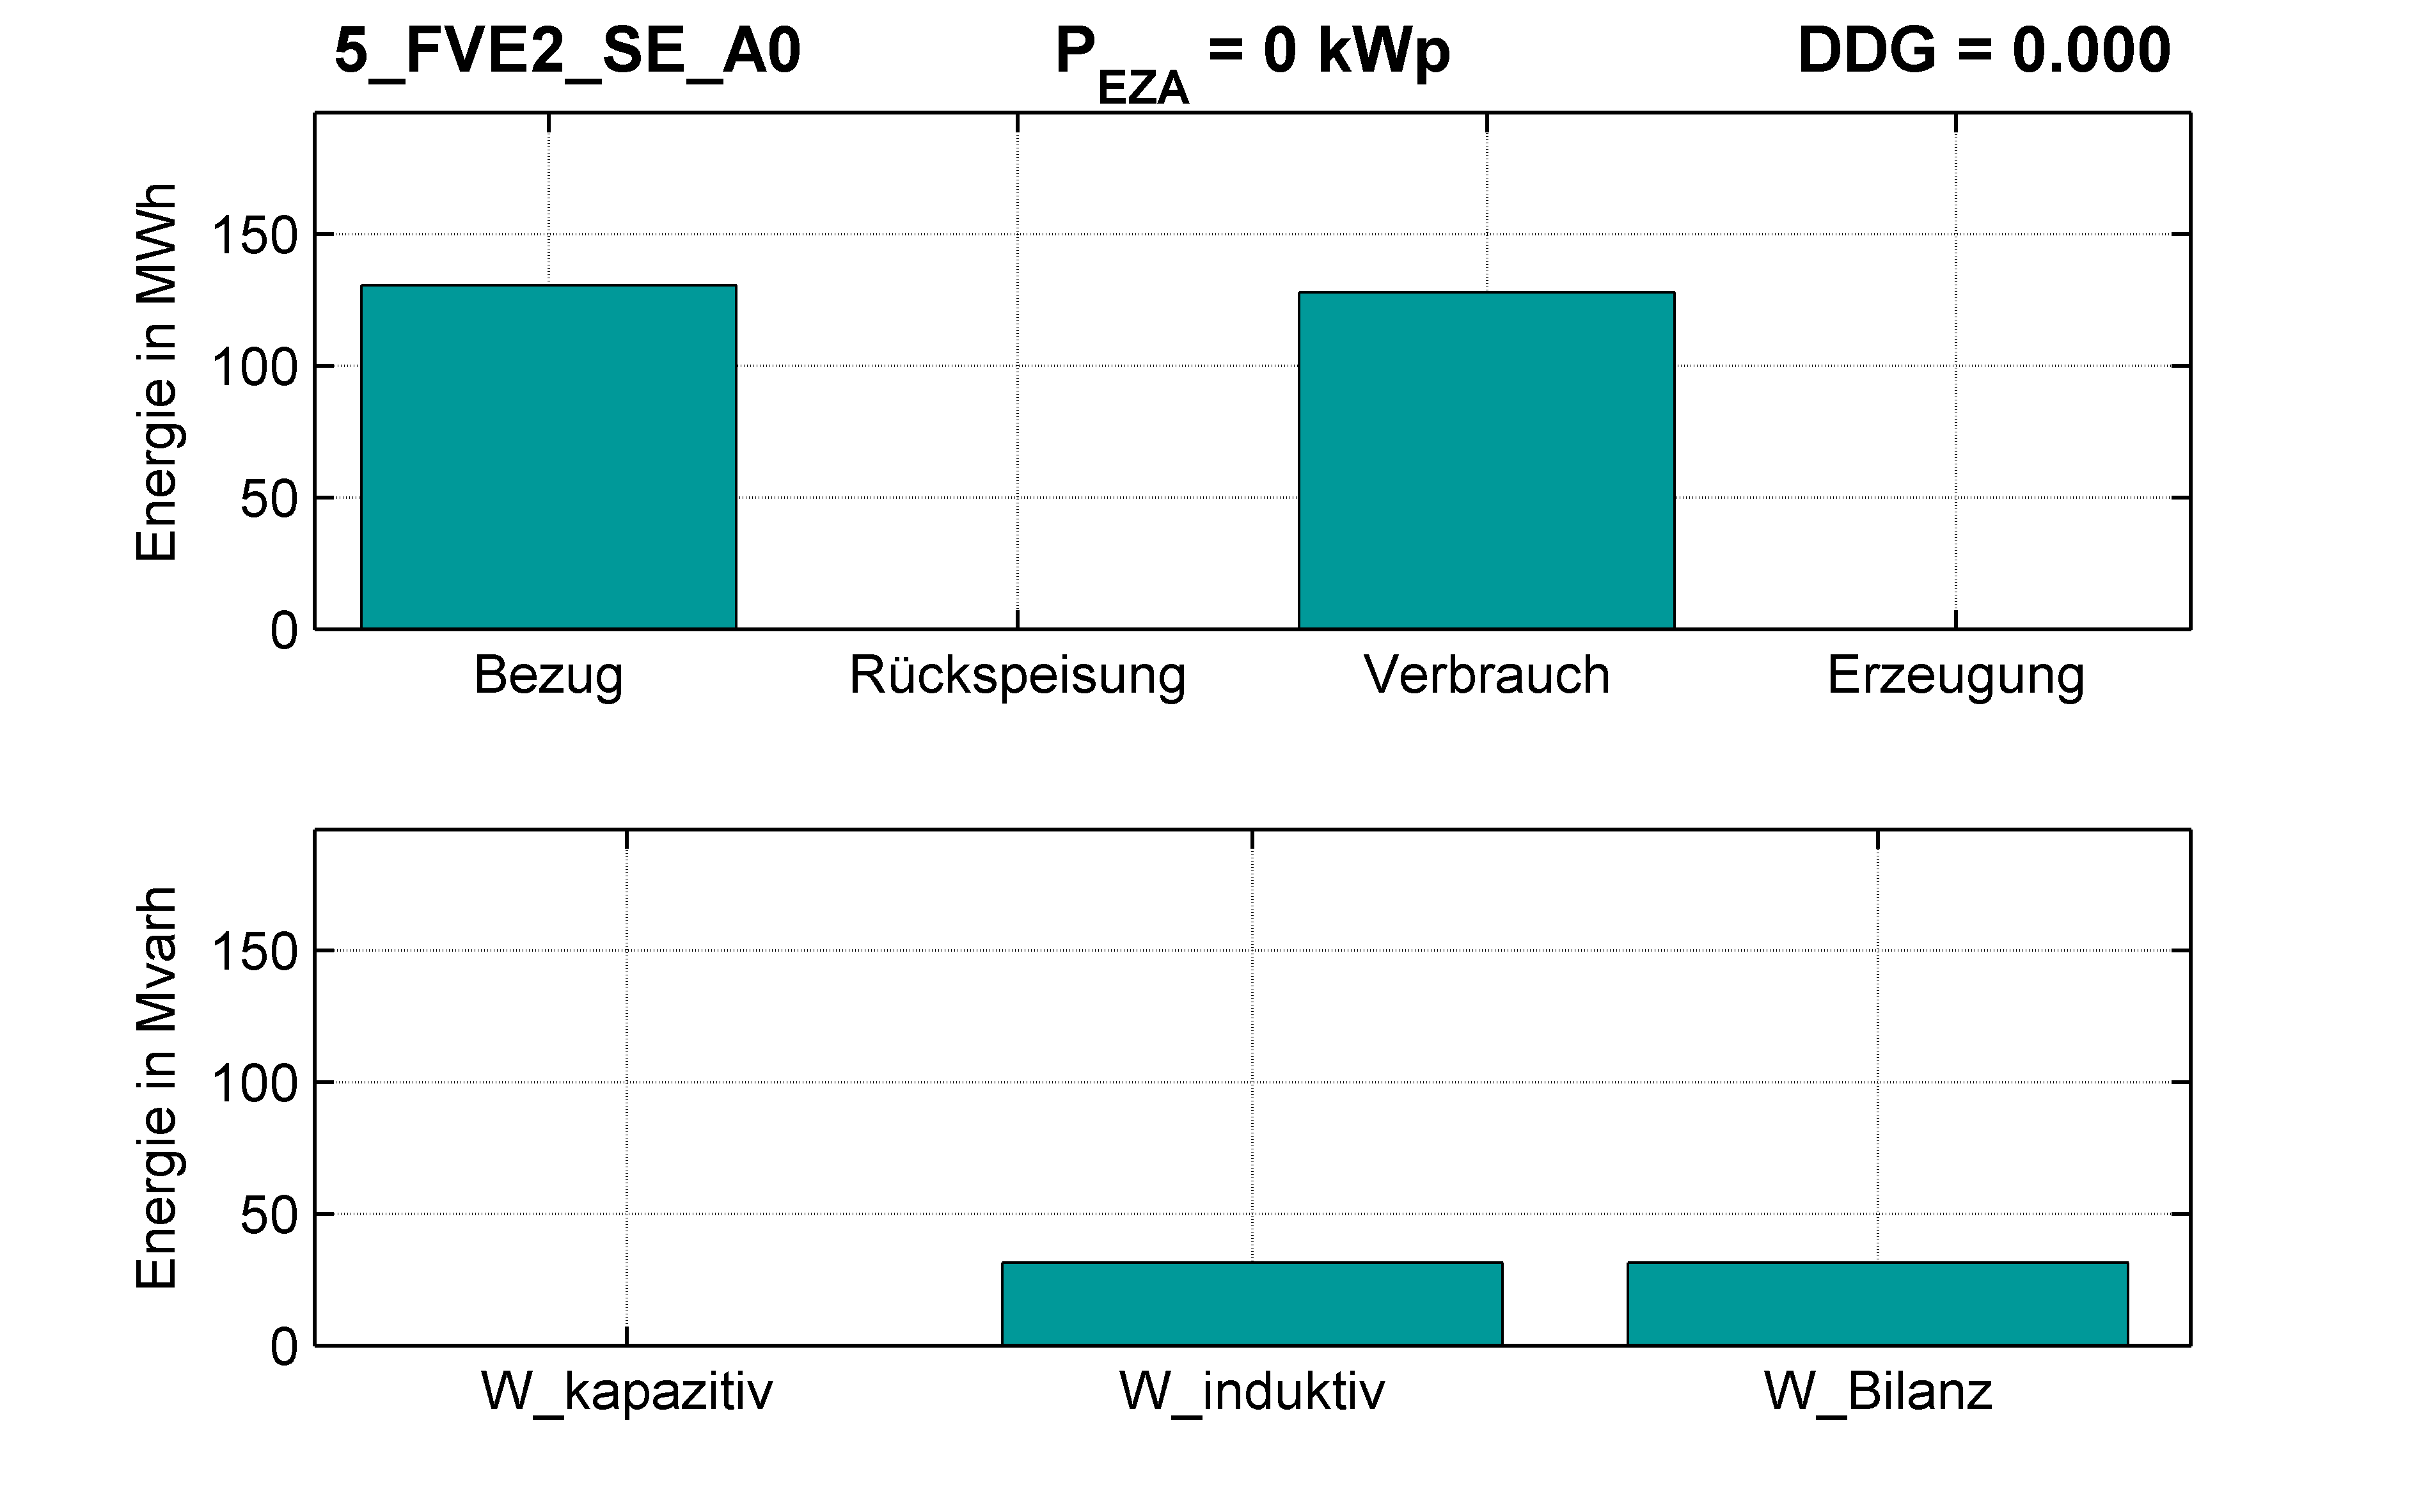 FVE2 | STATION (SE) A0 | PQ-Bilanz